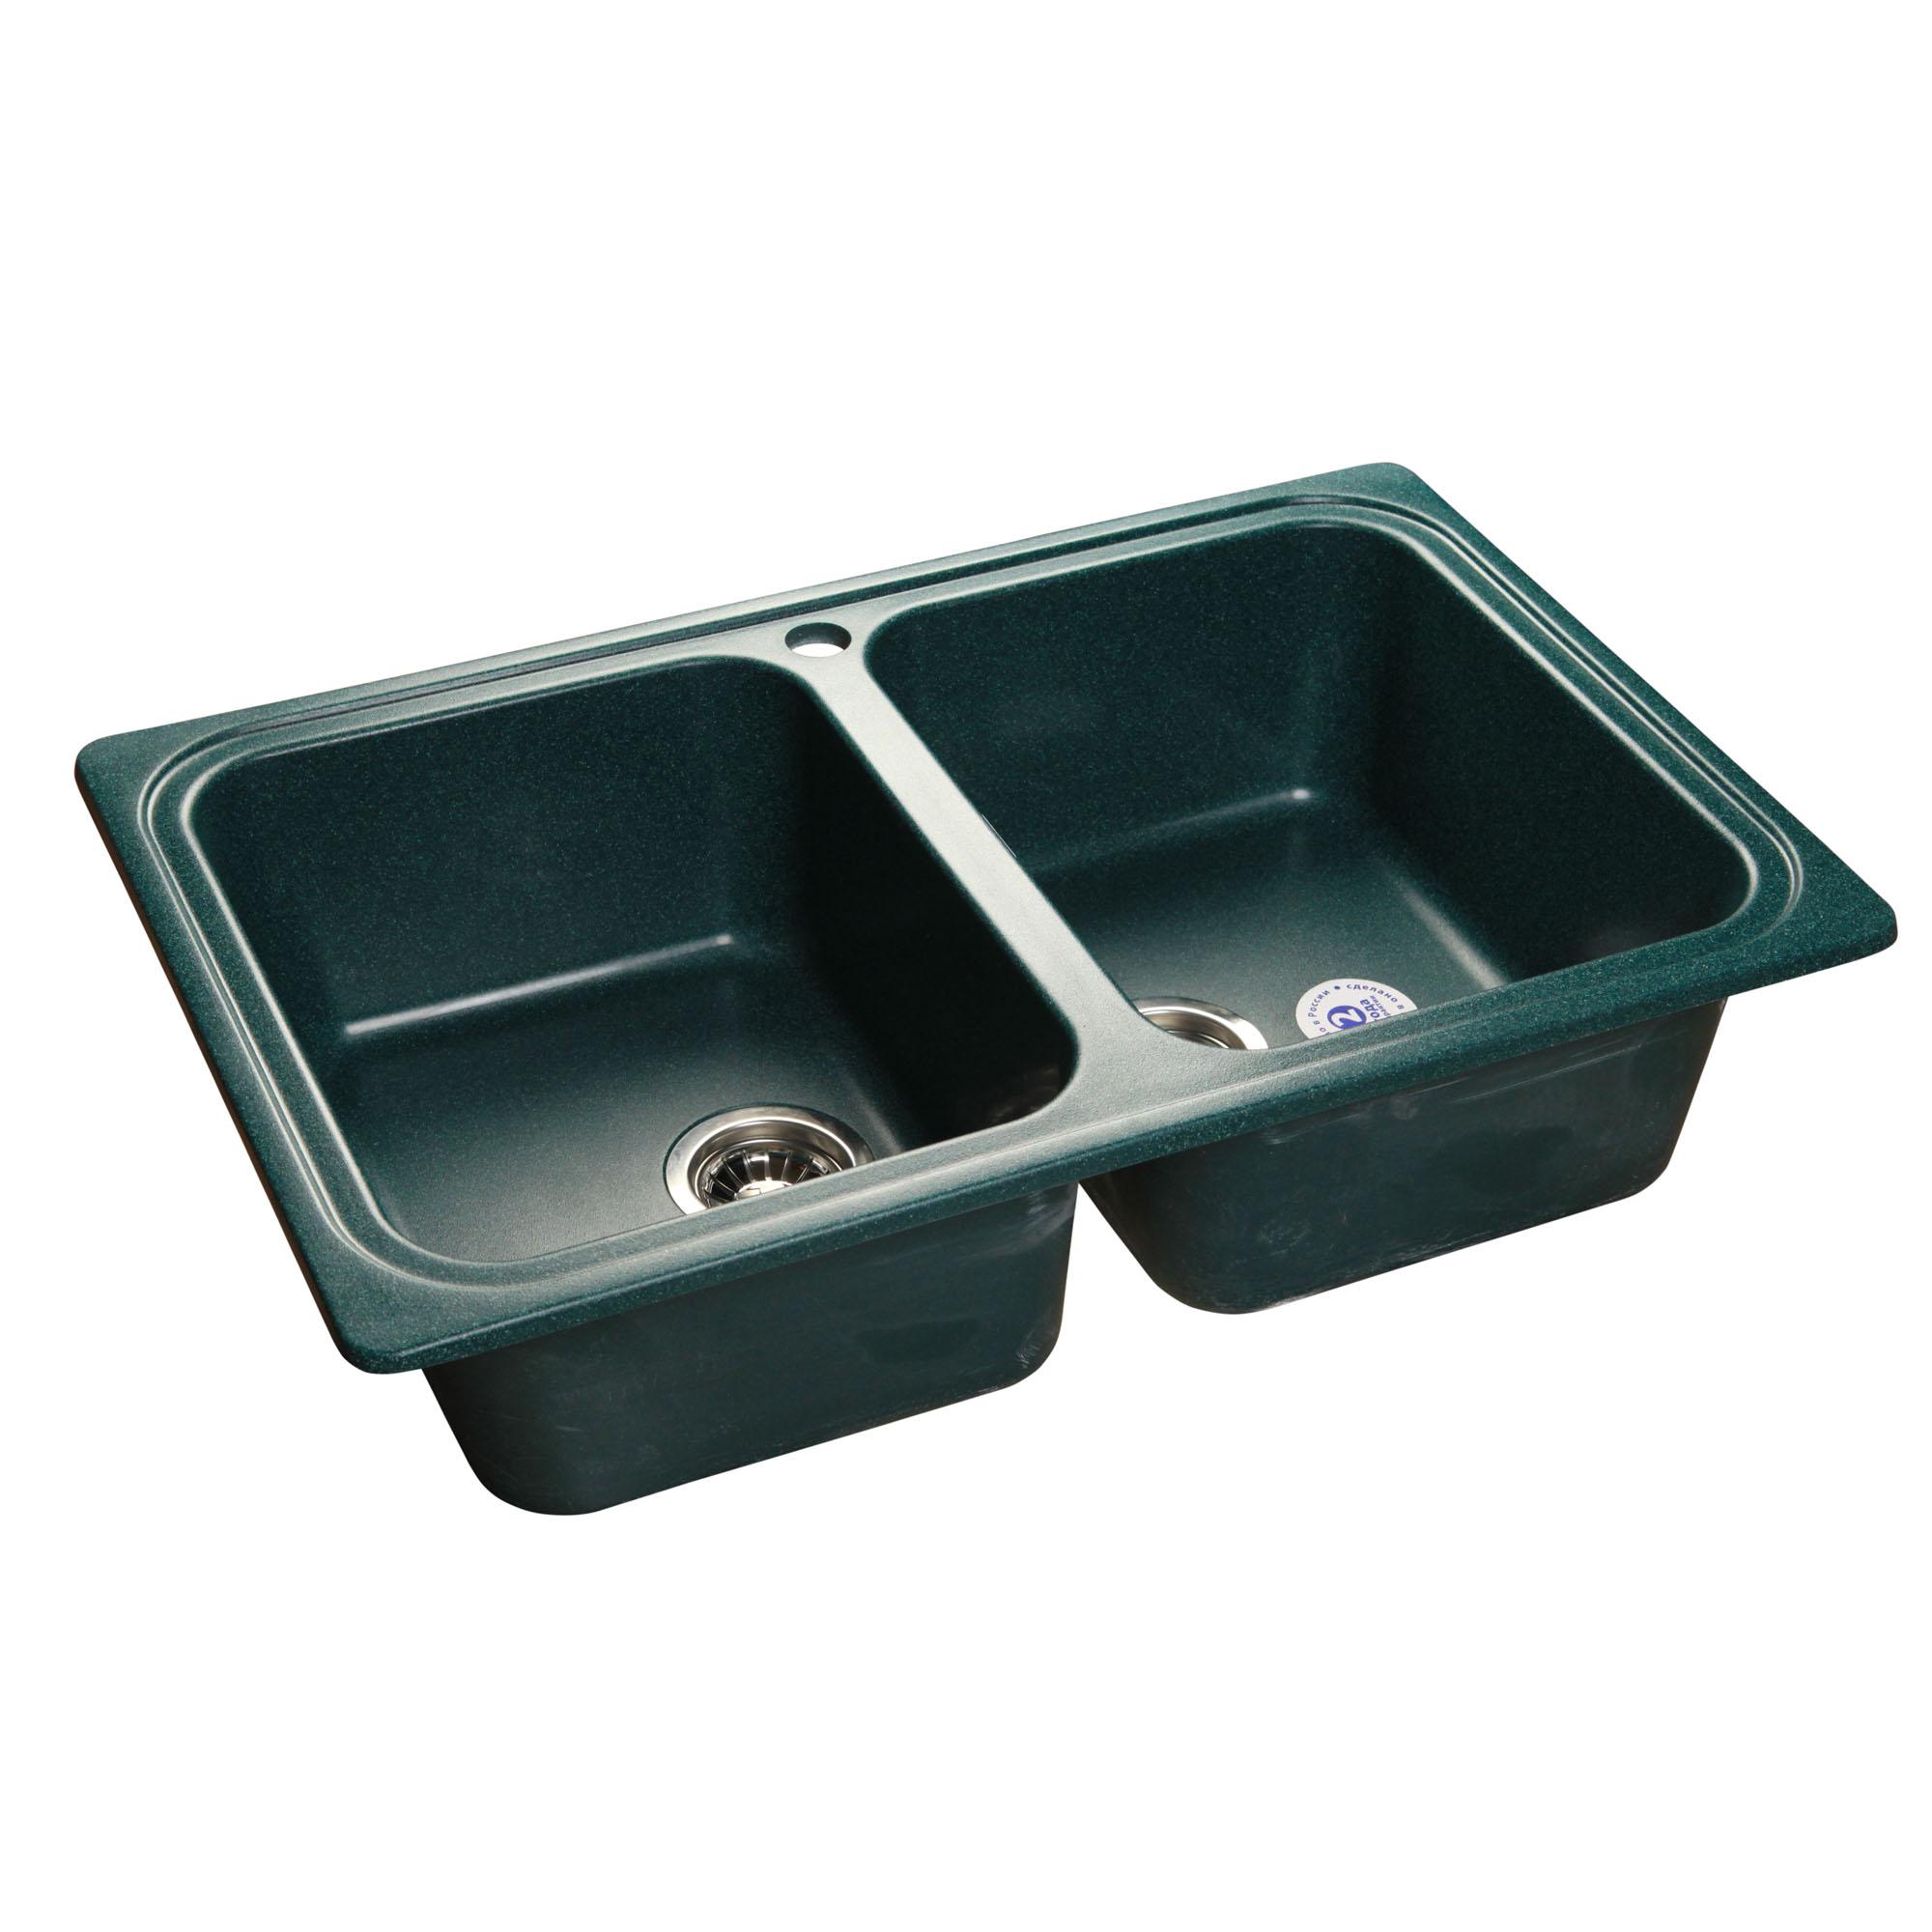 Кухонная мойка GranFest Standart GF-S780K зеленый атс ip yeastar standart